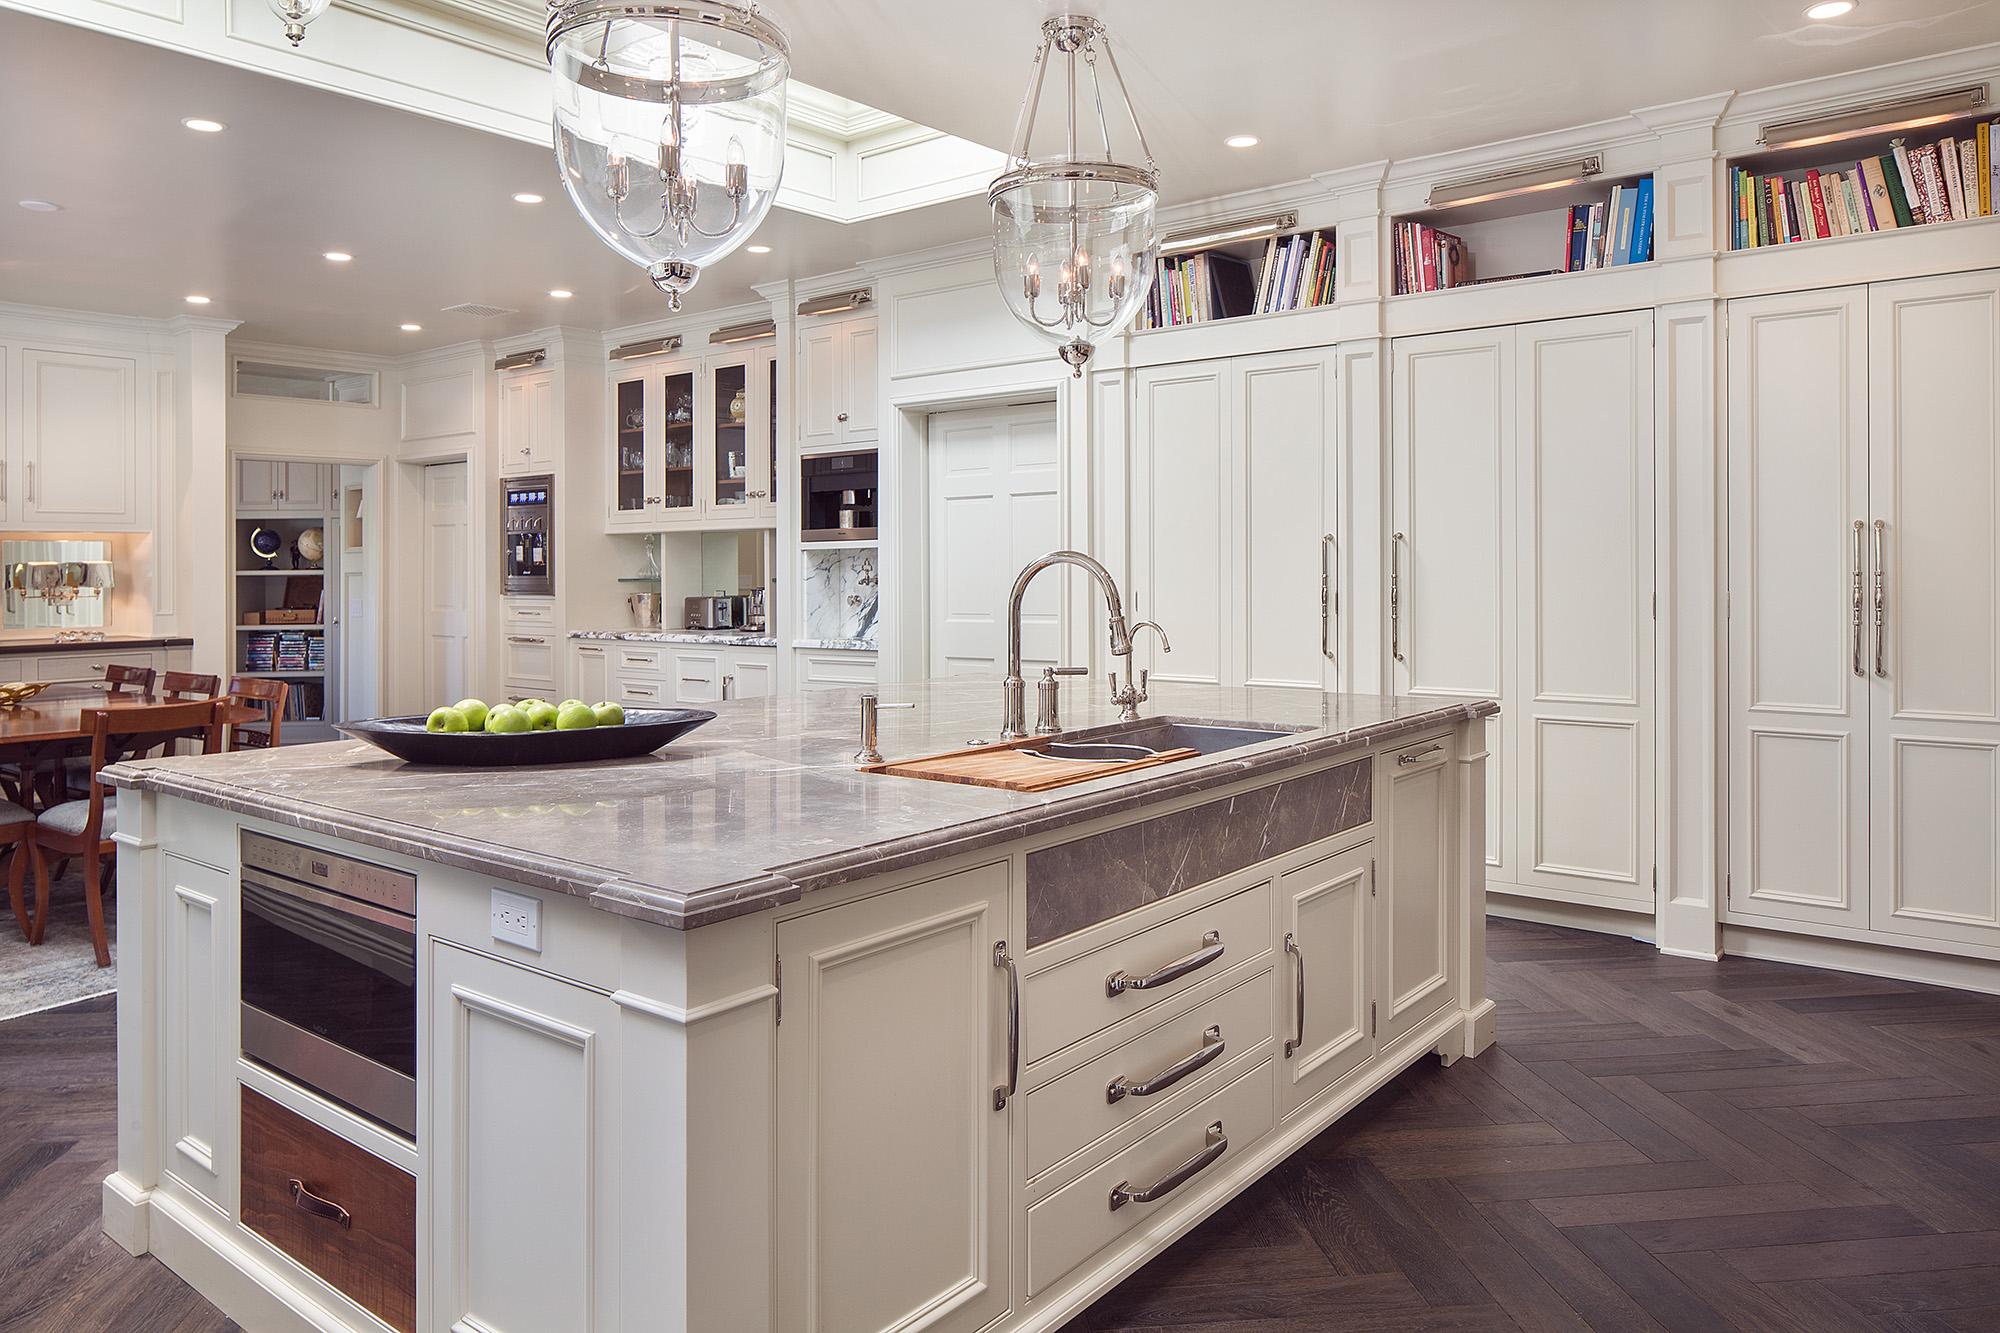 kitchen-dining-island-chelsea.jpg